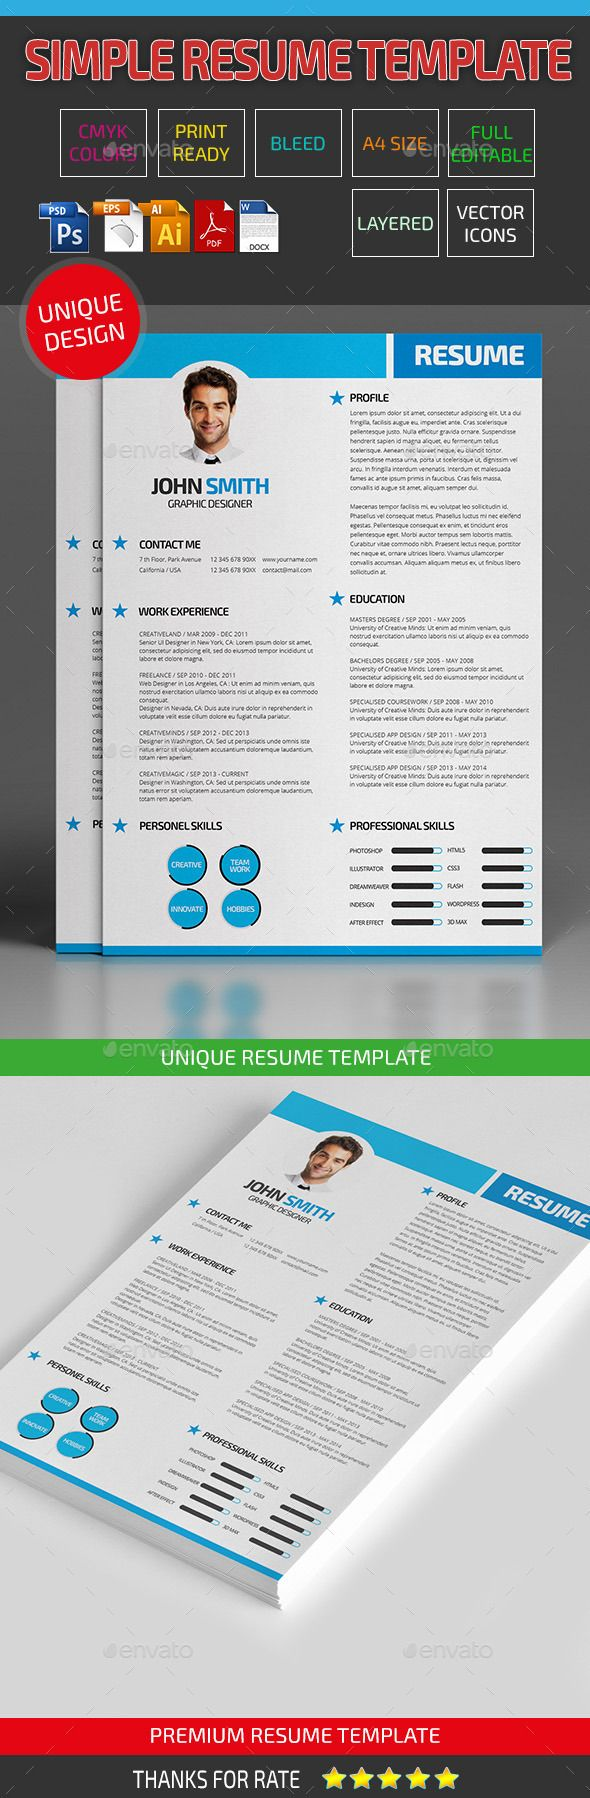 simple resume template 19 - Simple Resume Template